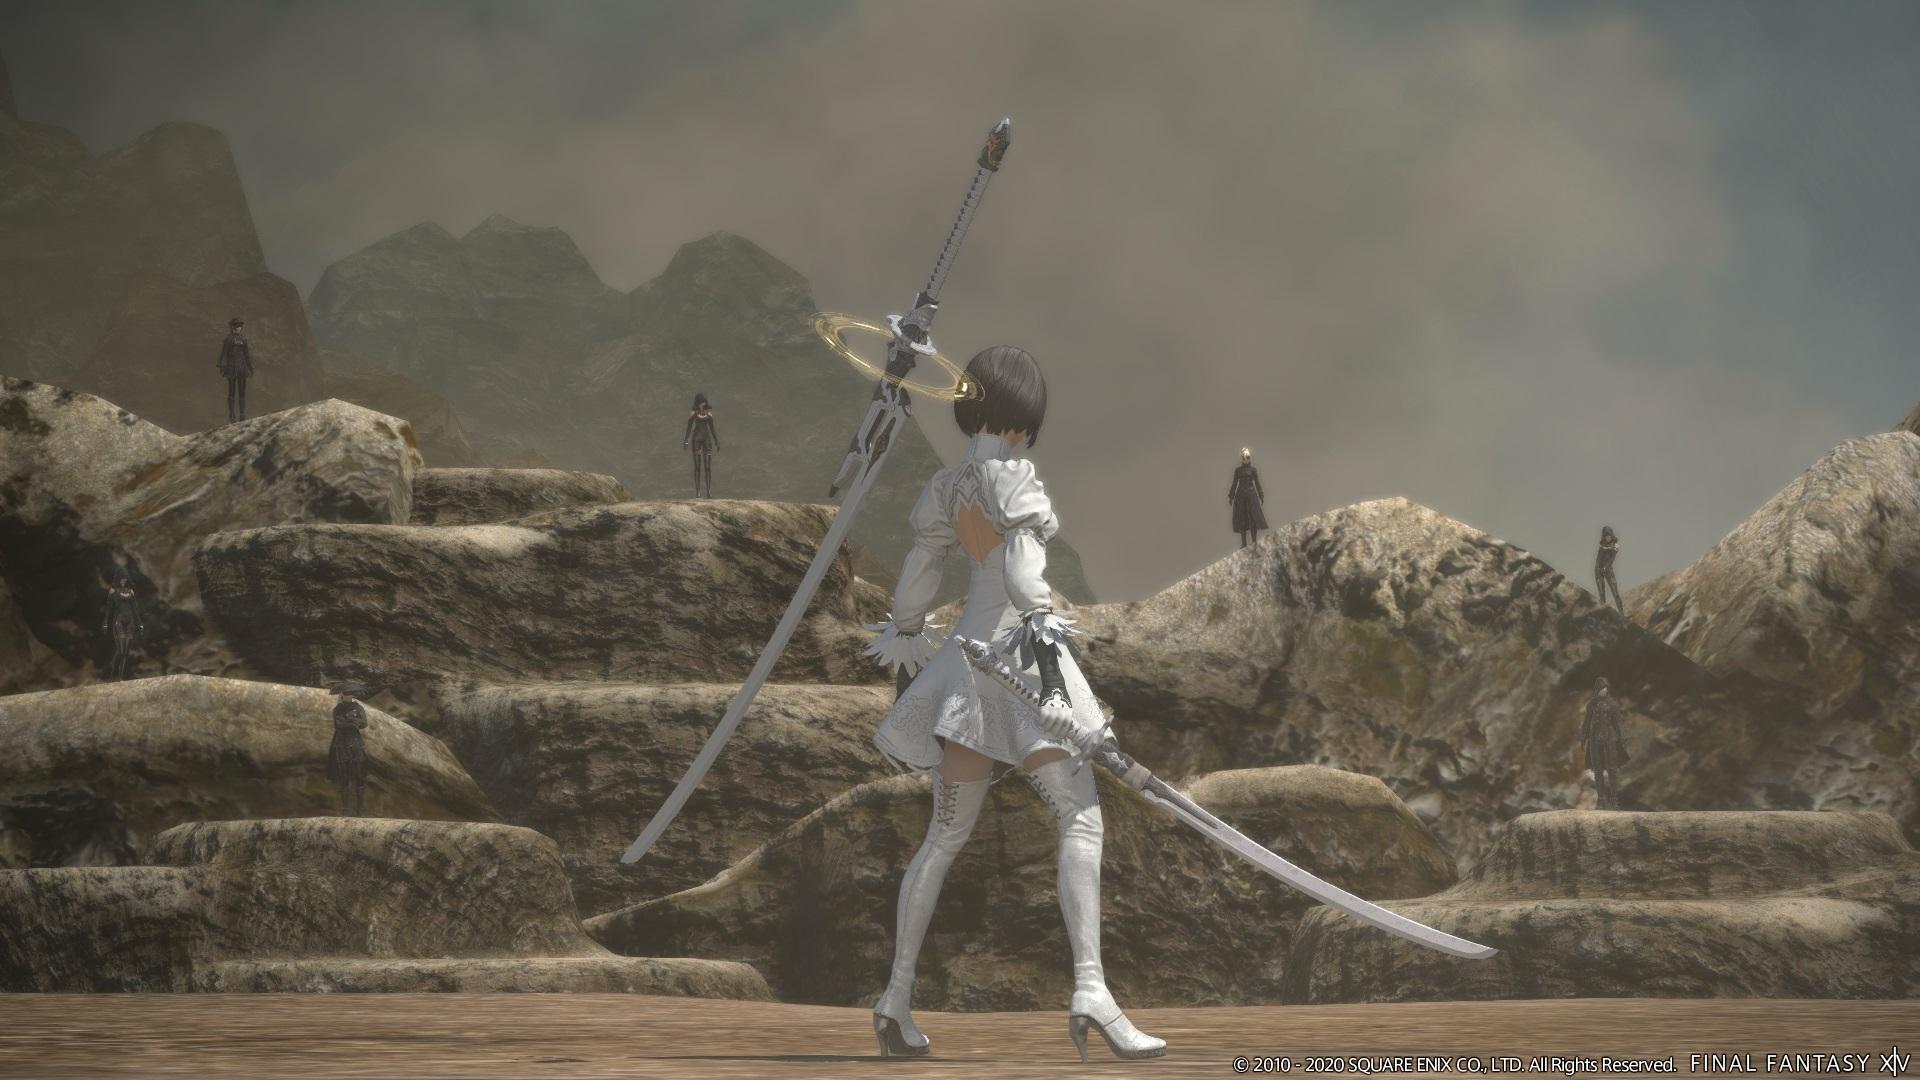 Final Fantasy 14 - Patch 5.3